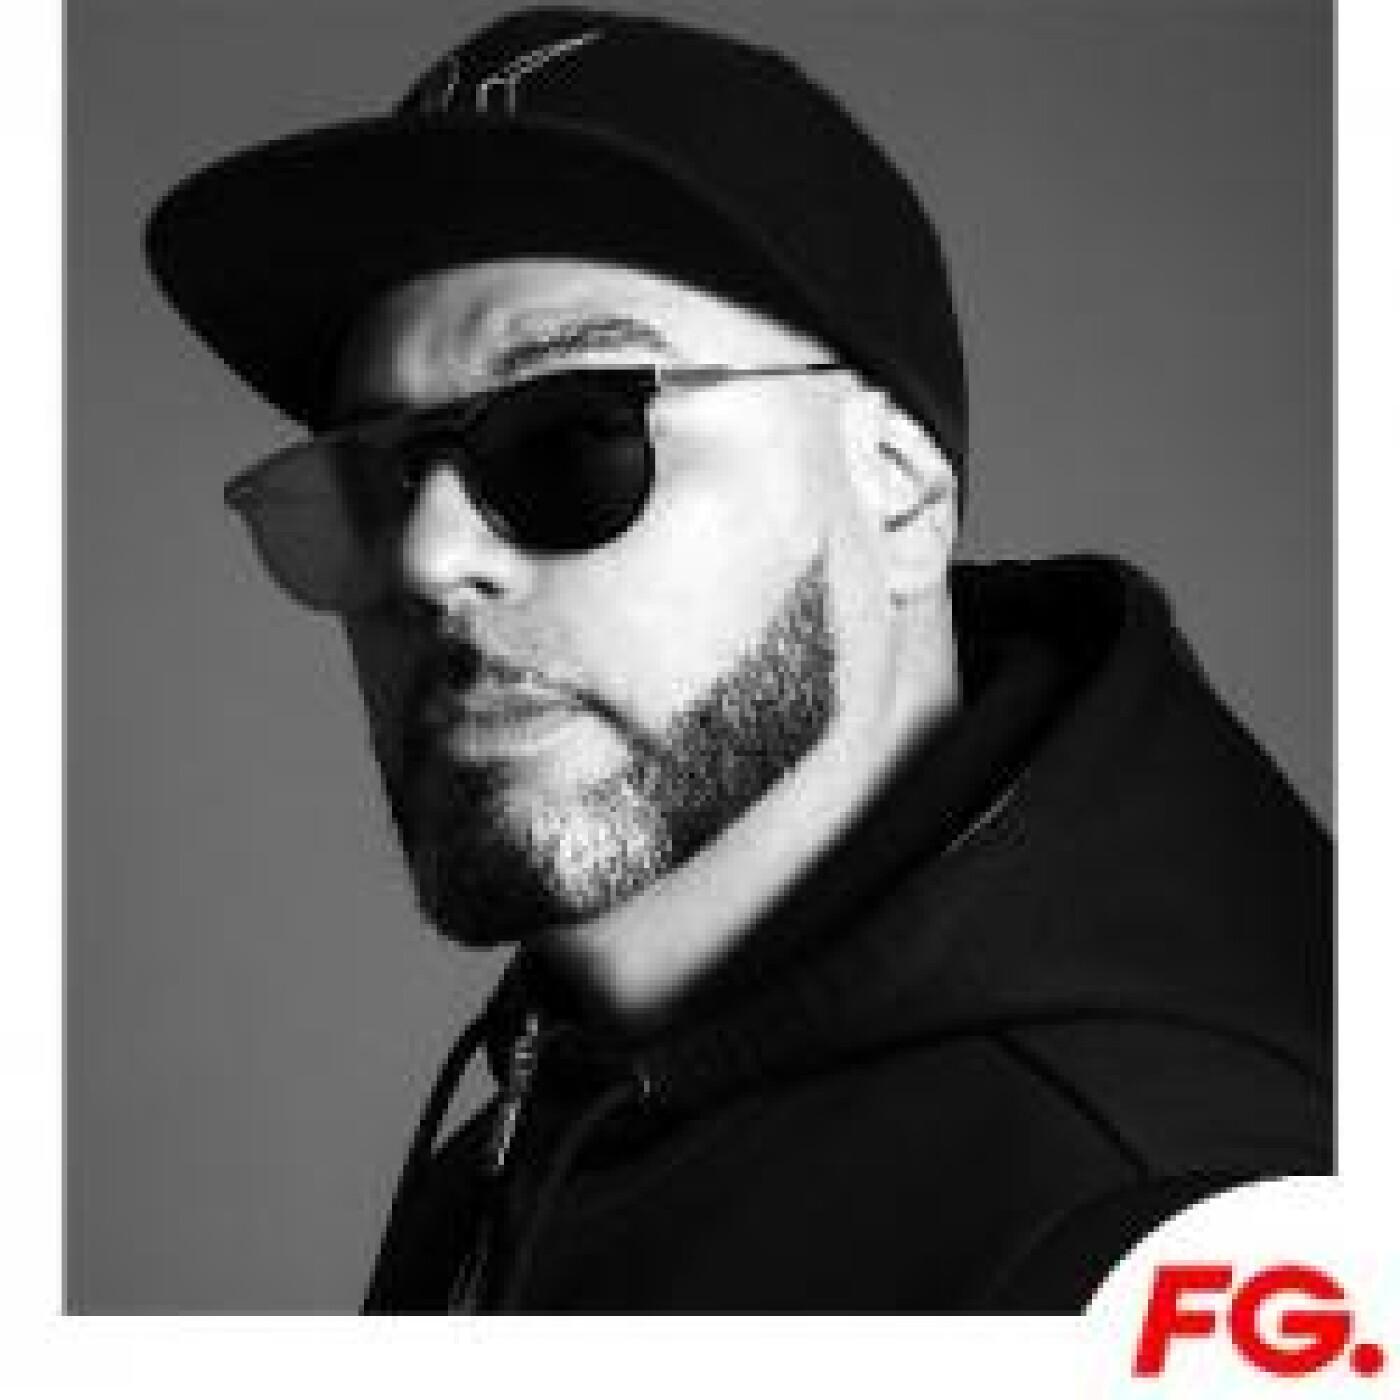 CLUB FG : ROGER SANCHEZ